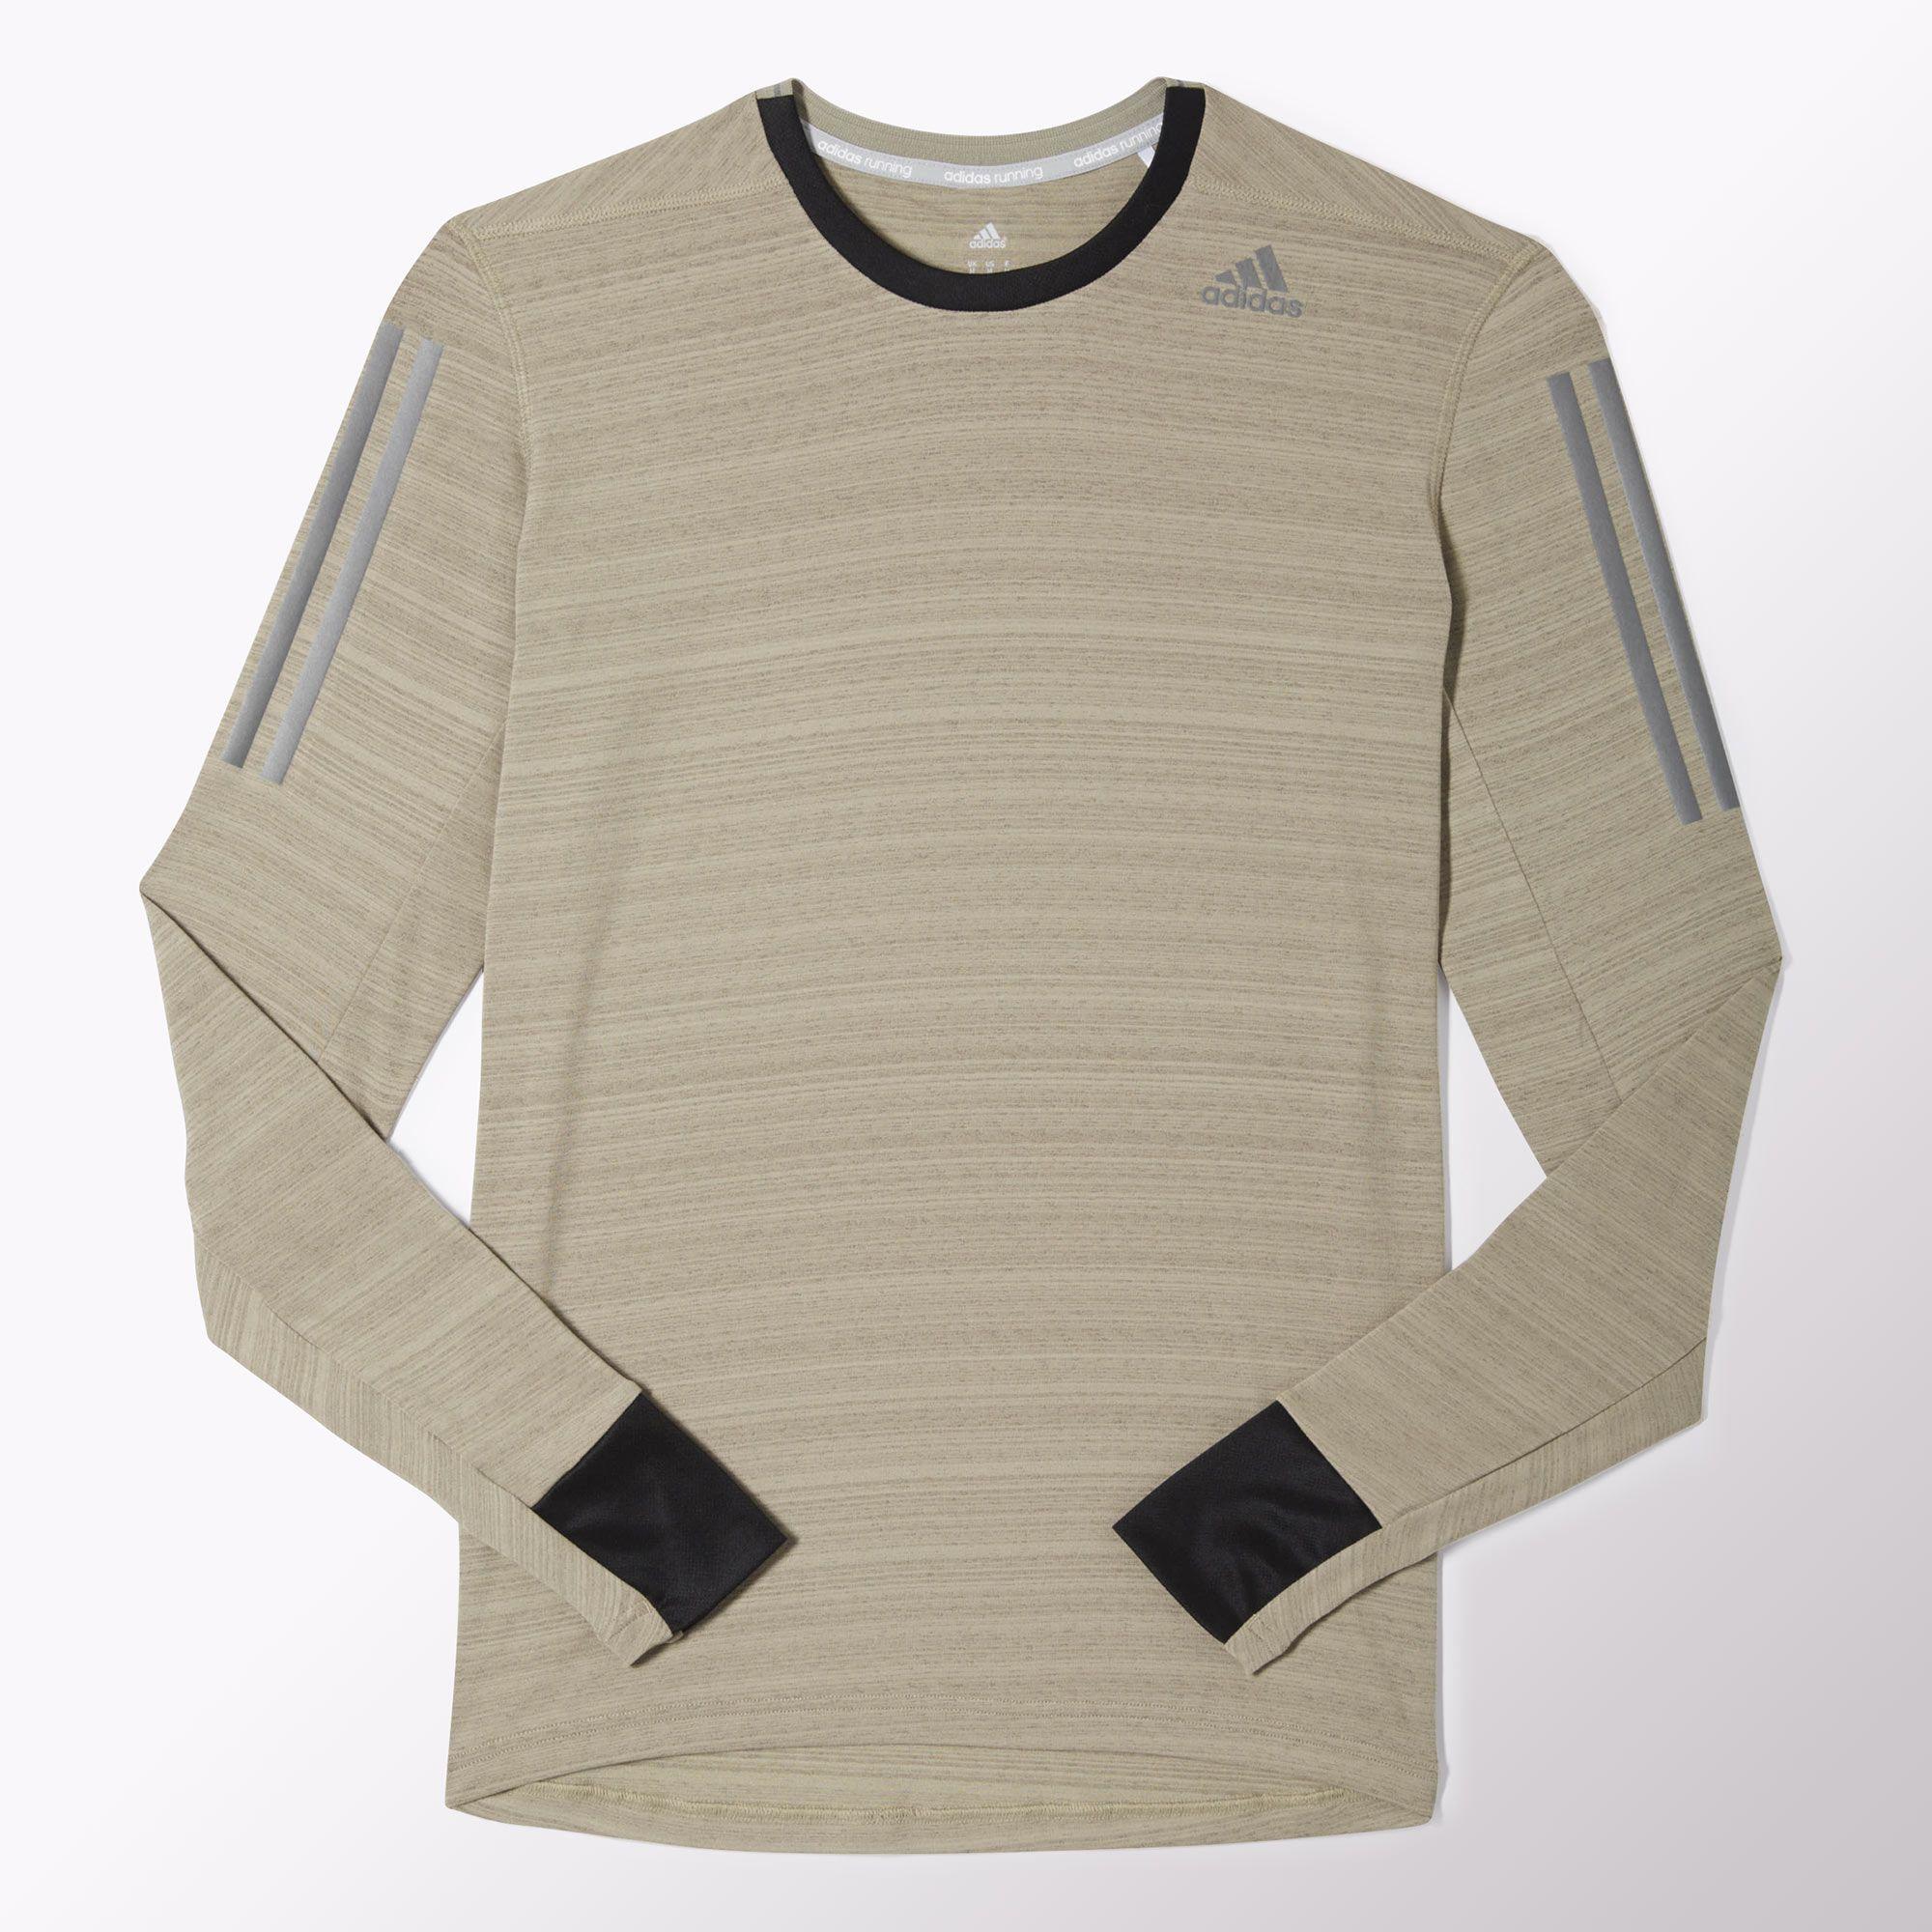 35397c59f7e Adidas Mens Supernova Long Sleeve Tee - Tech Beige/Black - Tennisnuts.com